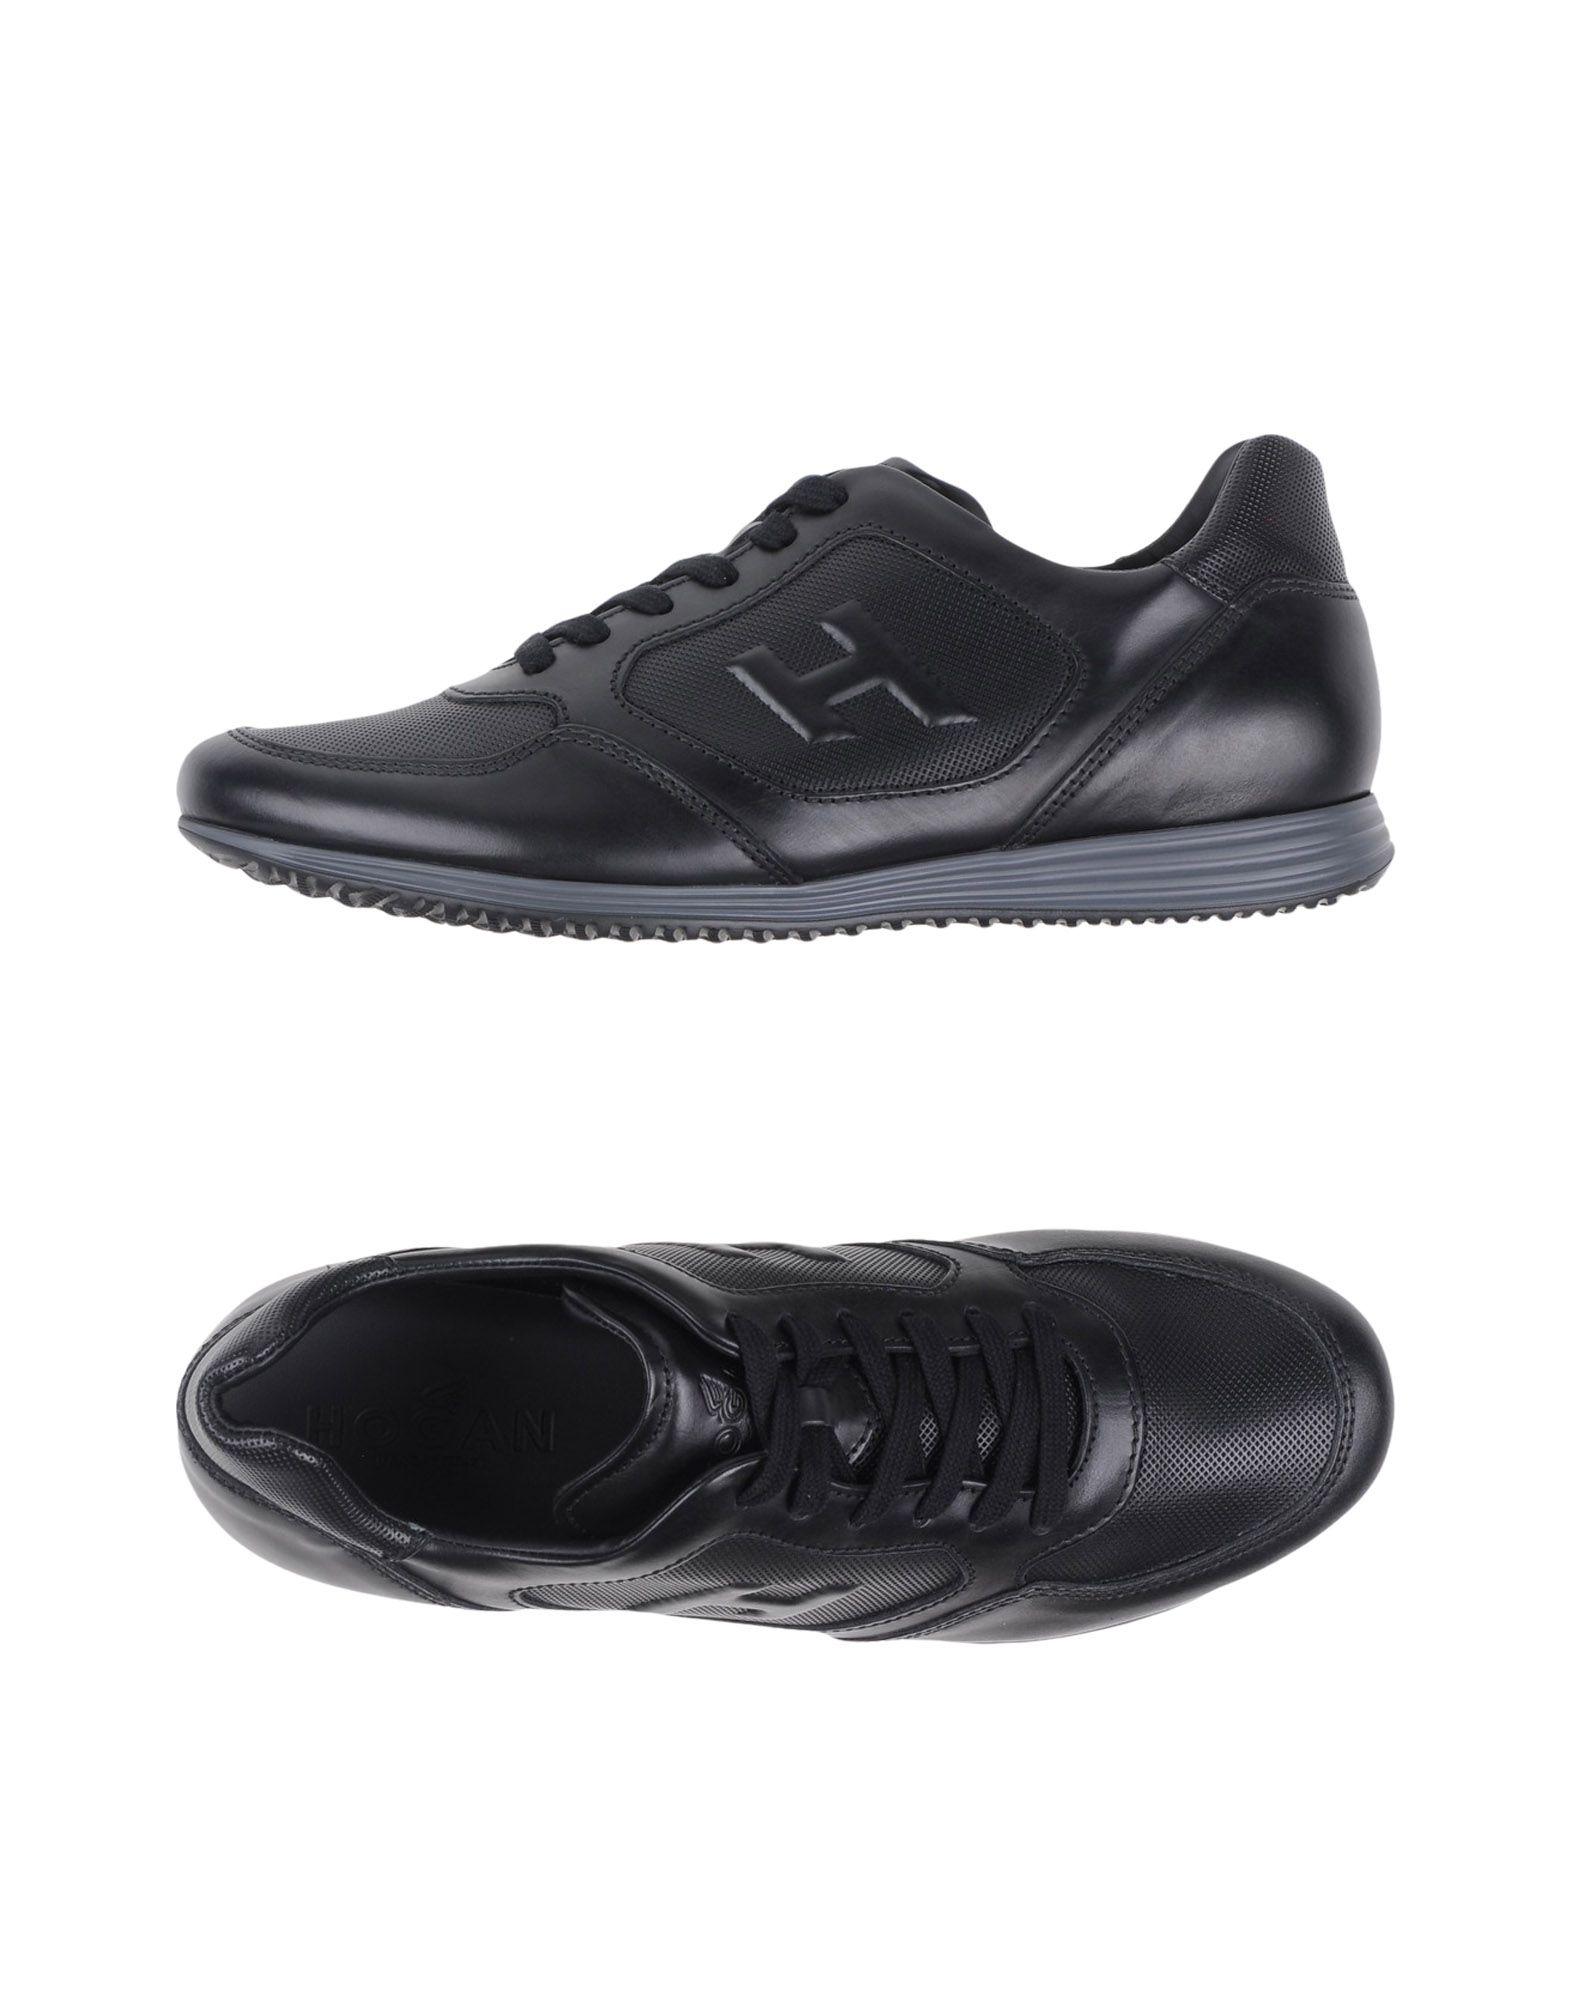 Moda Sneakers Hogan Uomo - 11036456OW